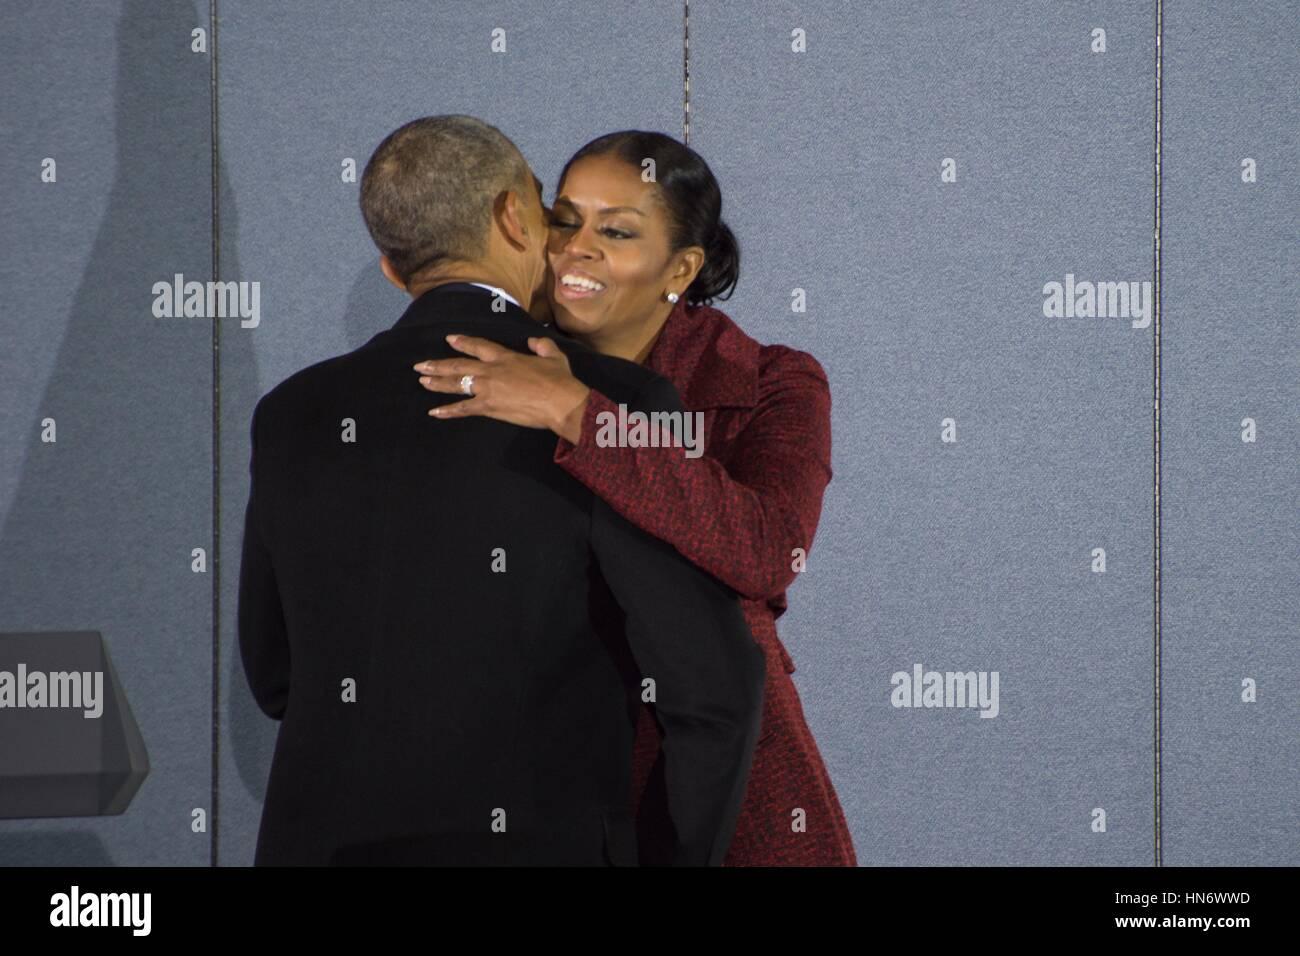 former us president barack obama hugs his wife michelle